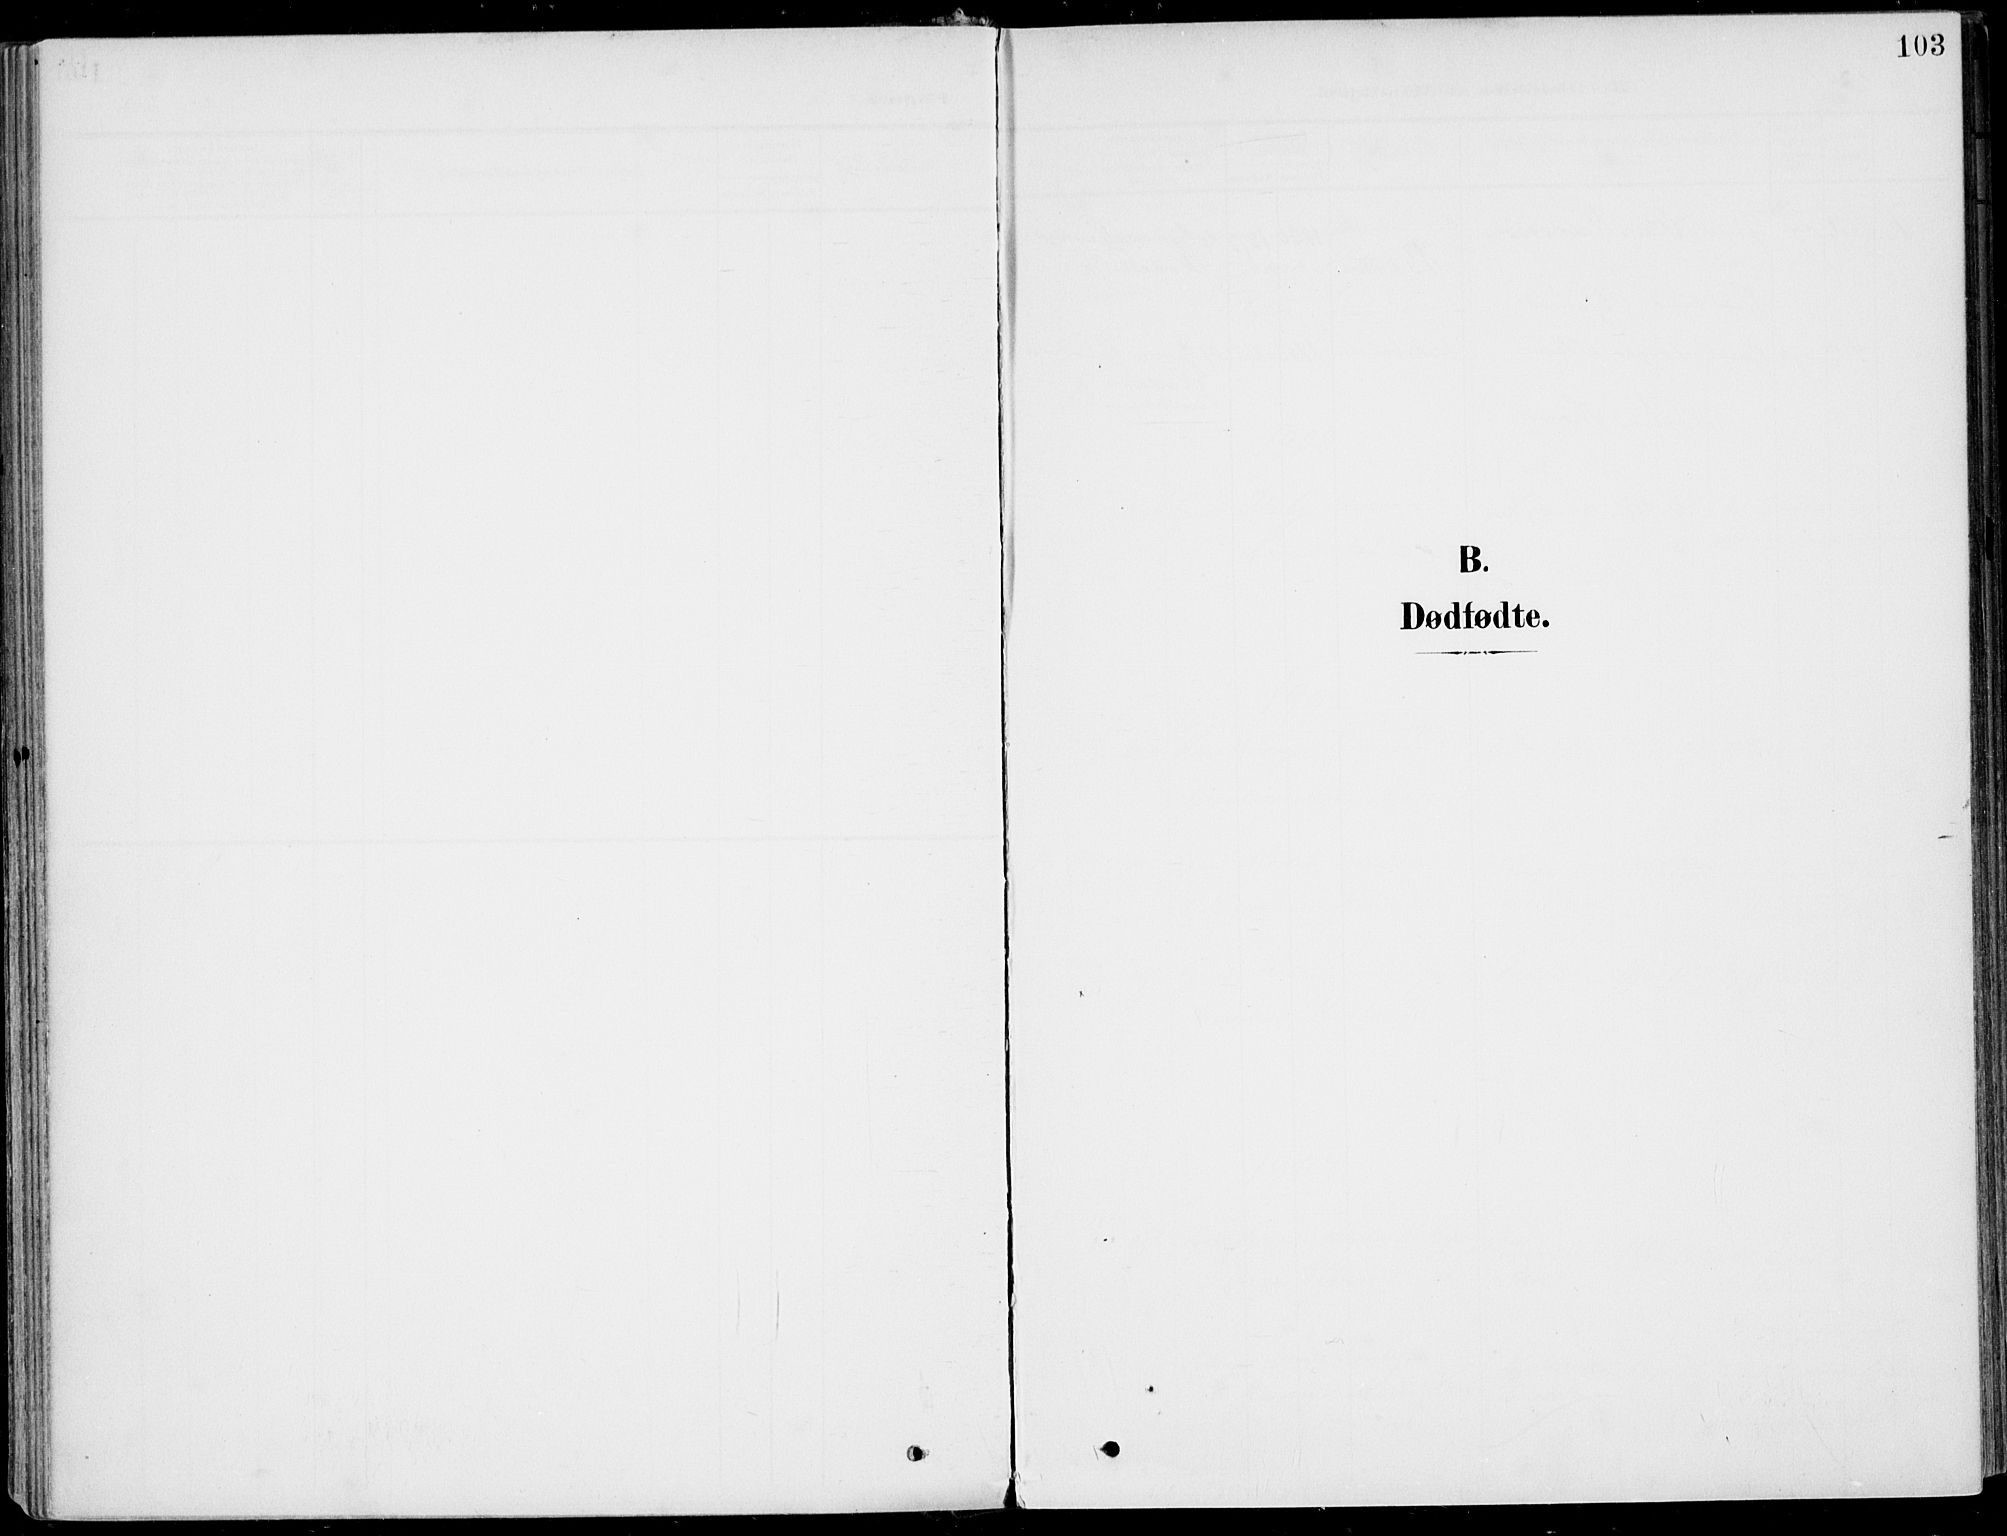 SAKO, Sigdal kirkebøker, F/Fb/L0002: Ministerialbok nr. II 2, 1901-1914, s. 103